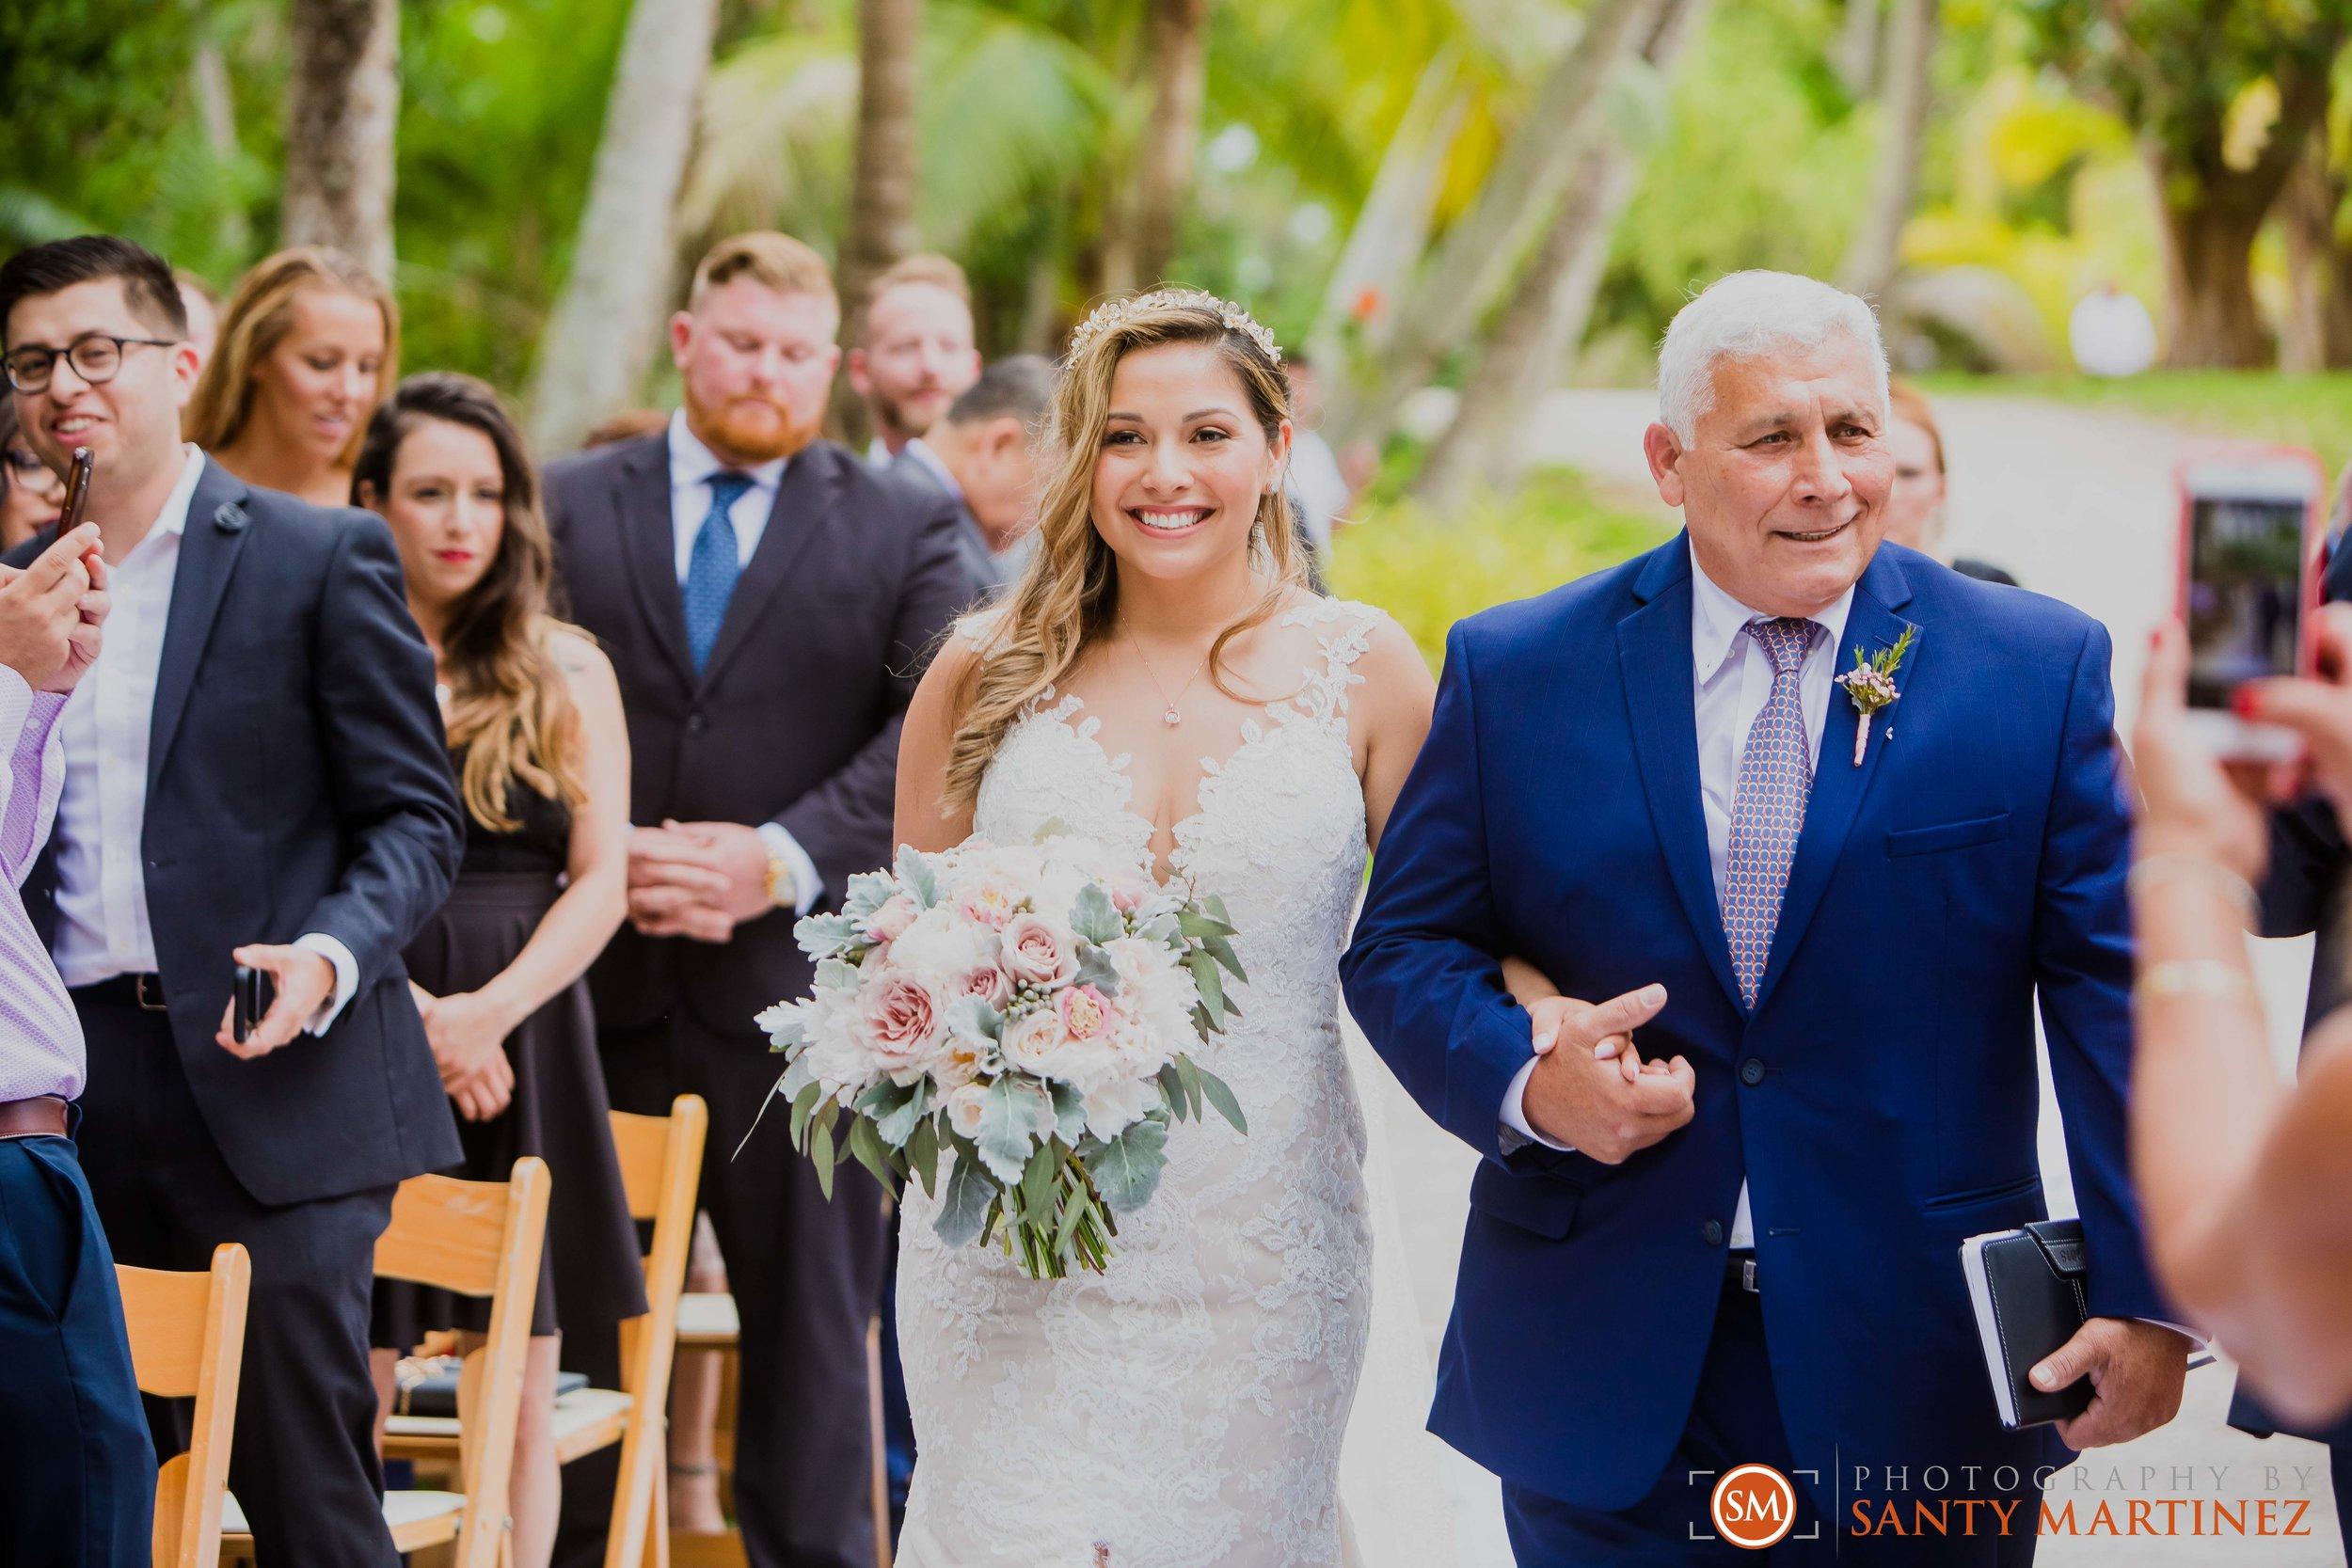 Wedding Bonnet House - Santy Martinez Photography-30.jpg